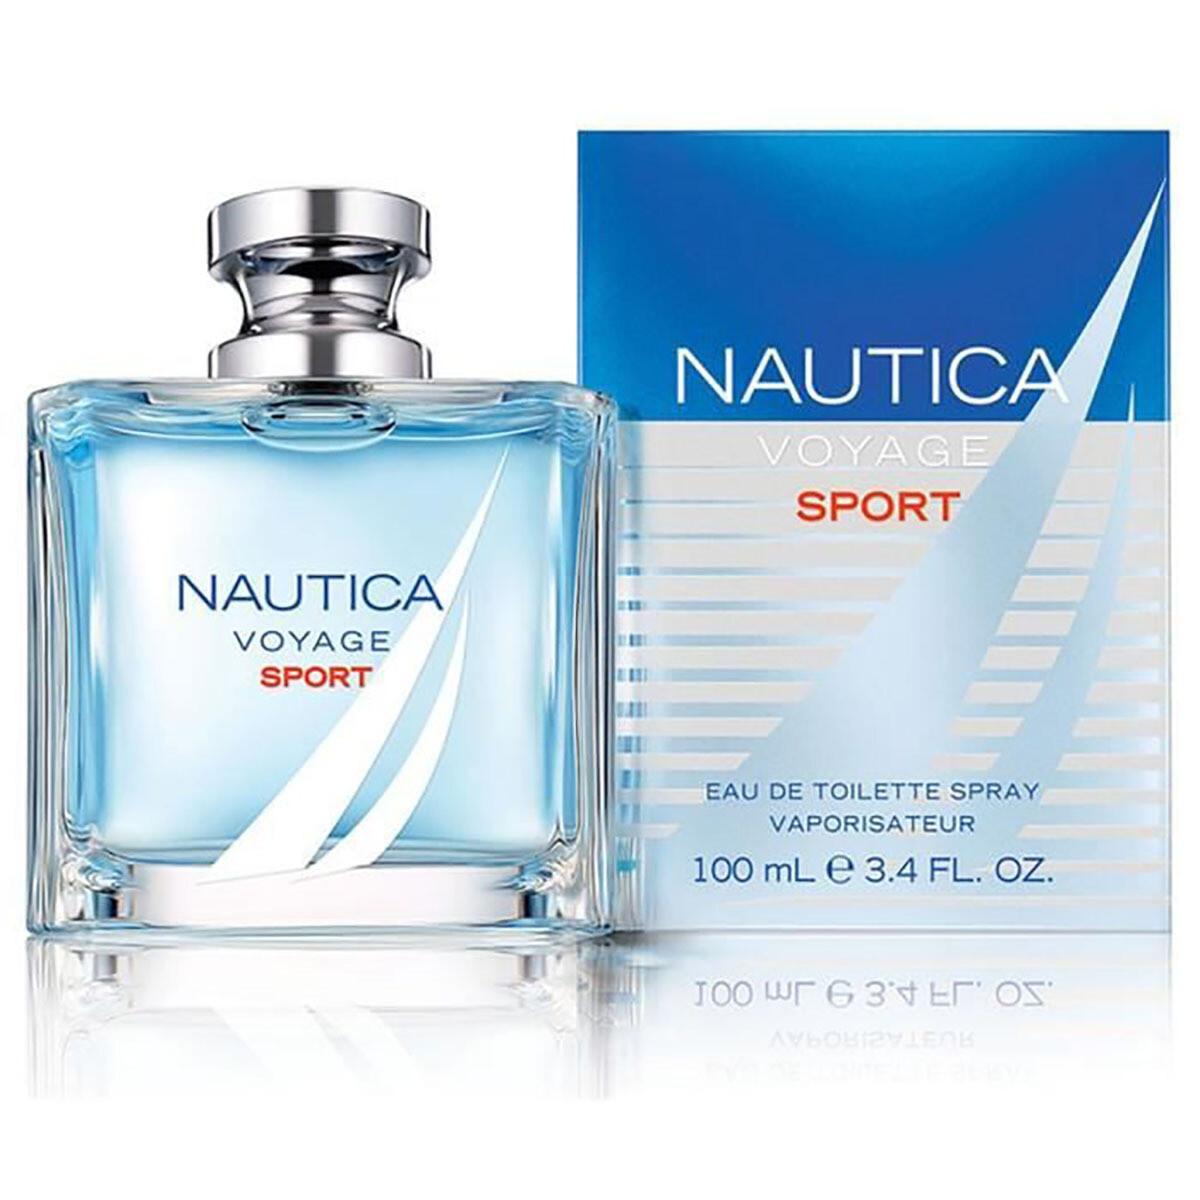 Nautica Voyage Sport 100ml H